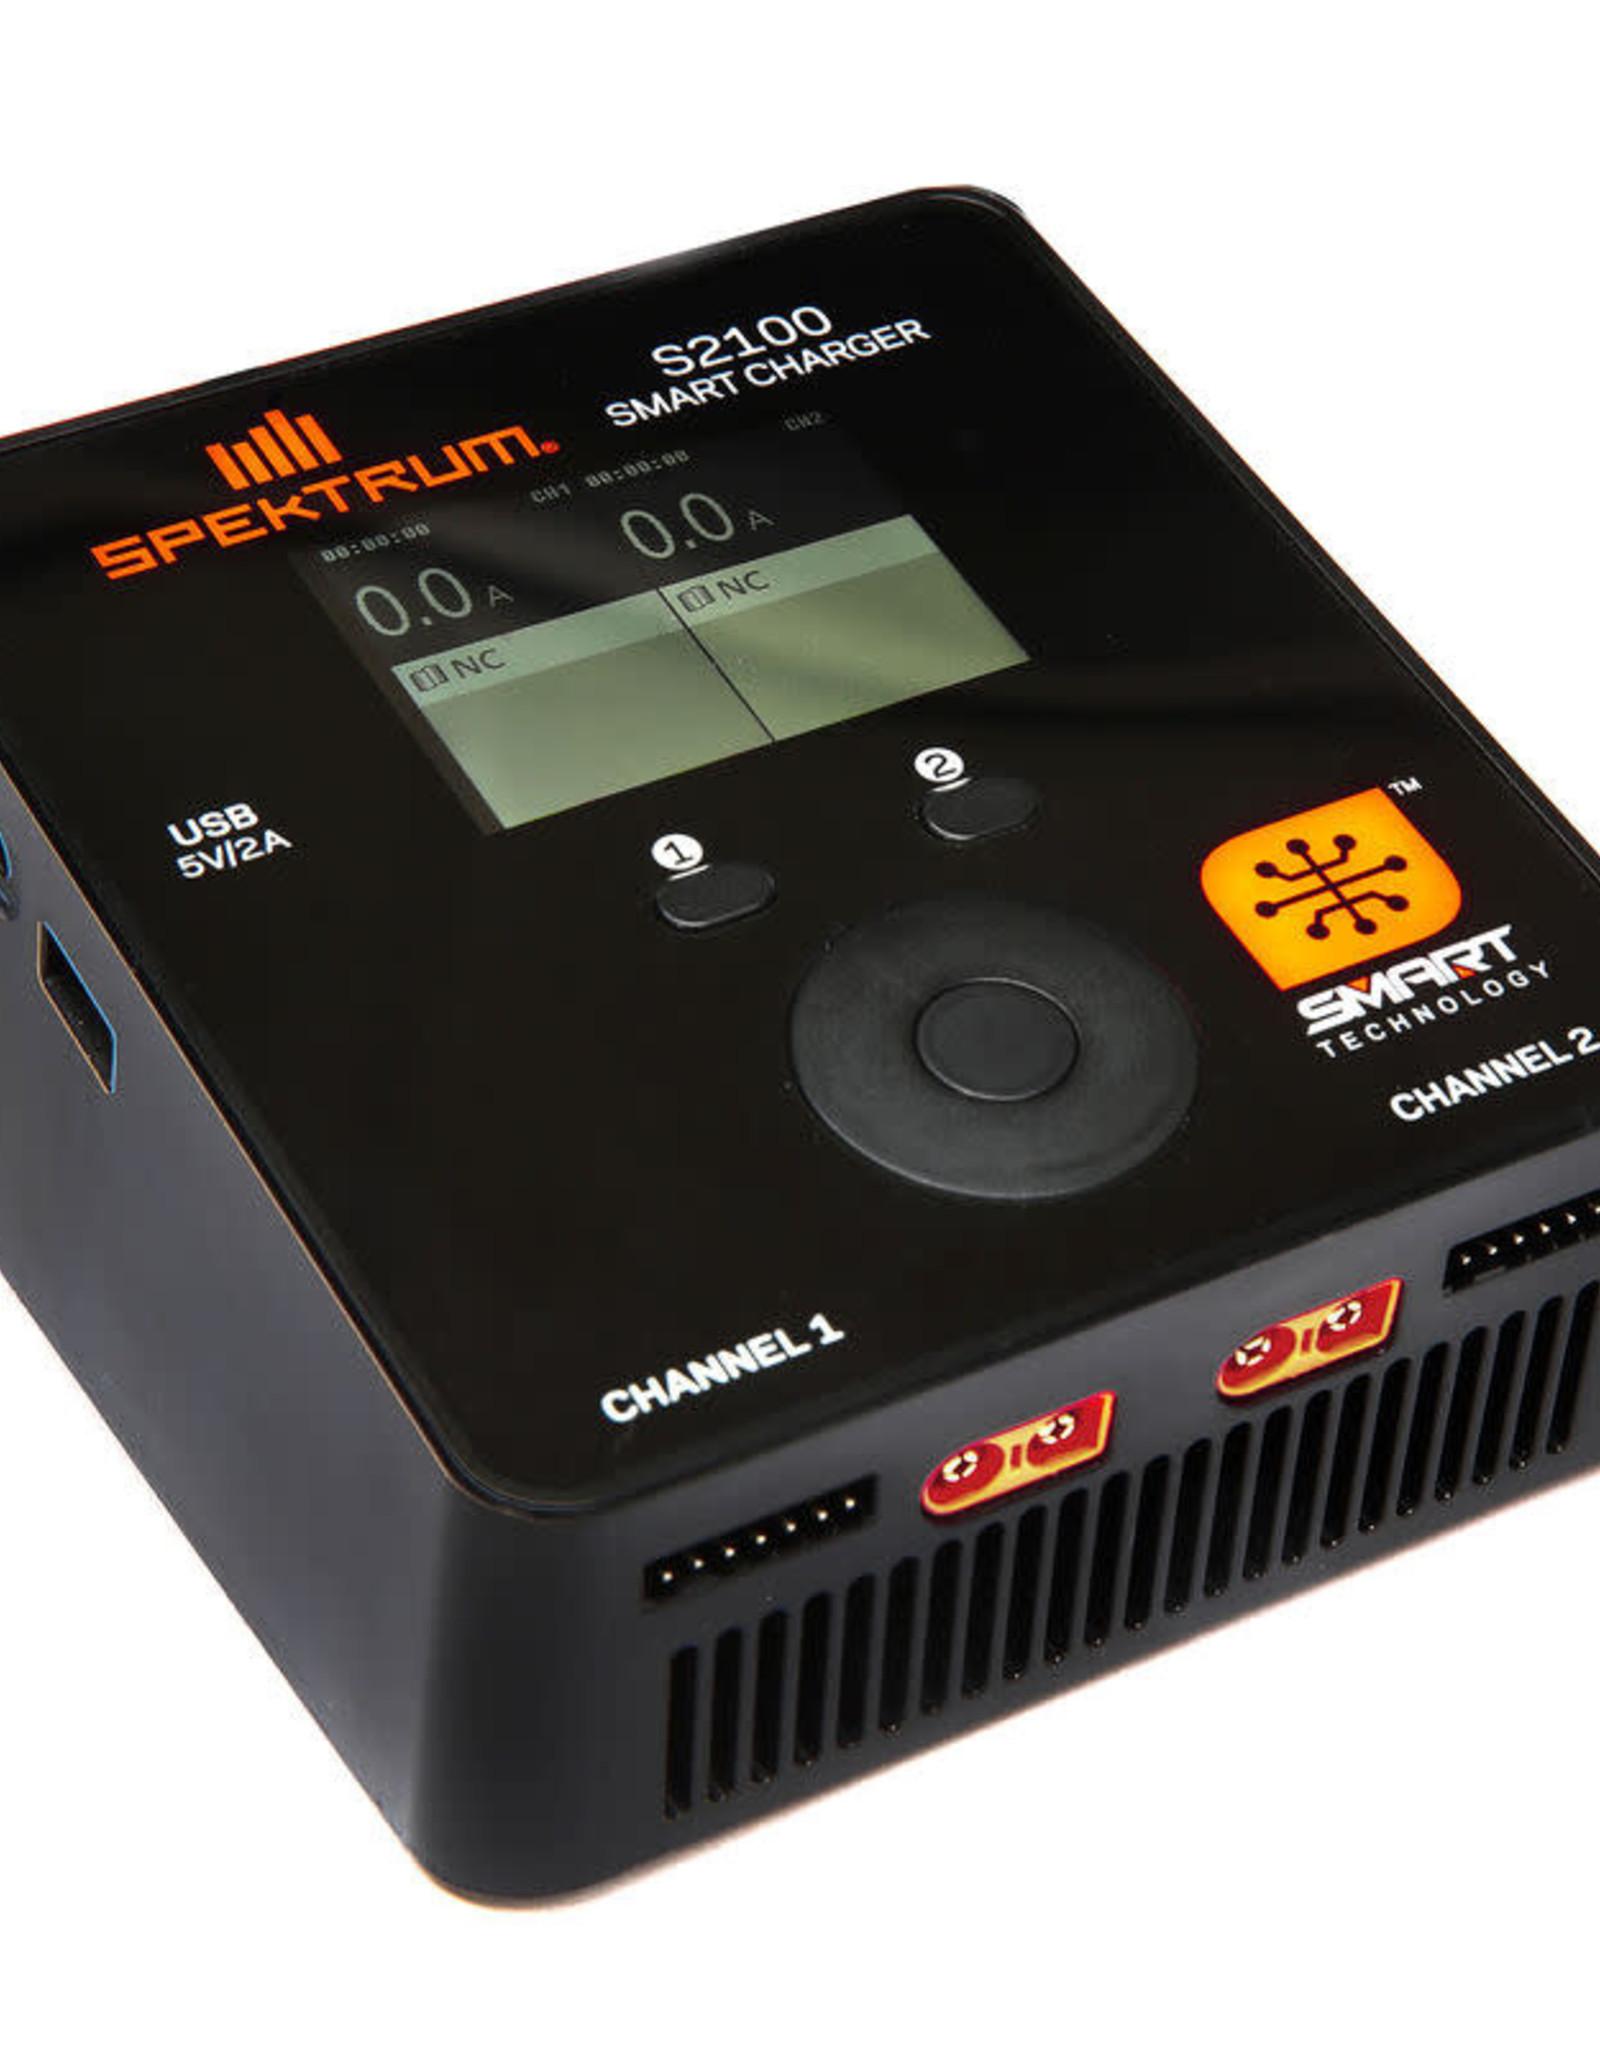 spektrum SPMXC1010 Spektrum Smart S2100 AC Charger, 2x100W